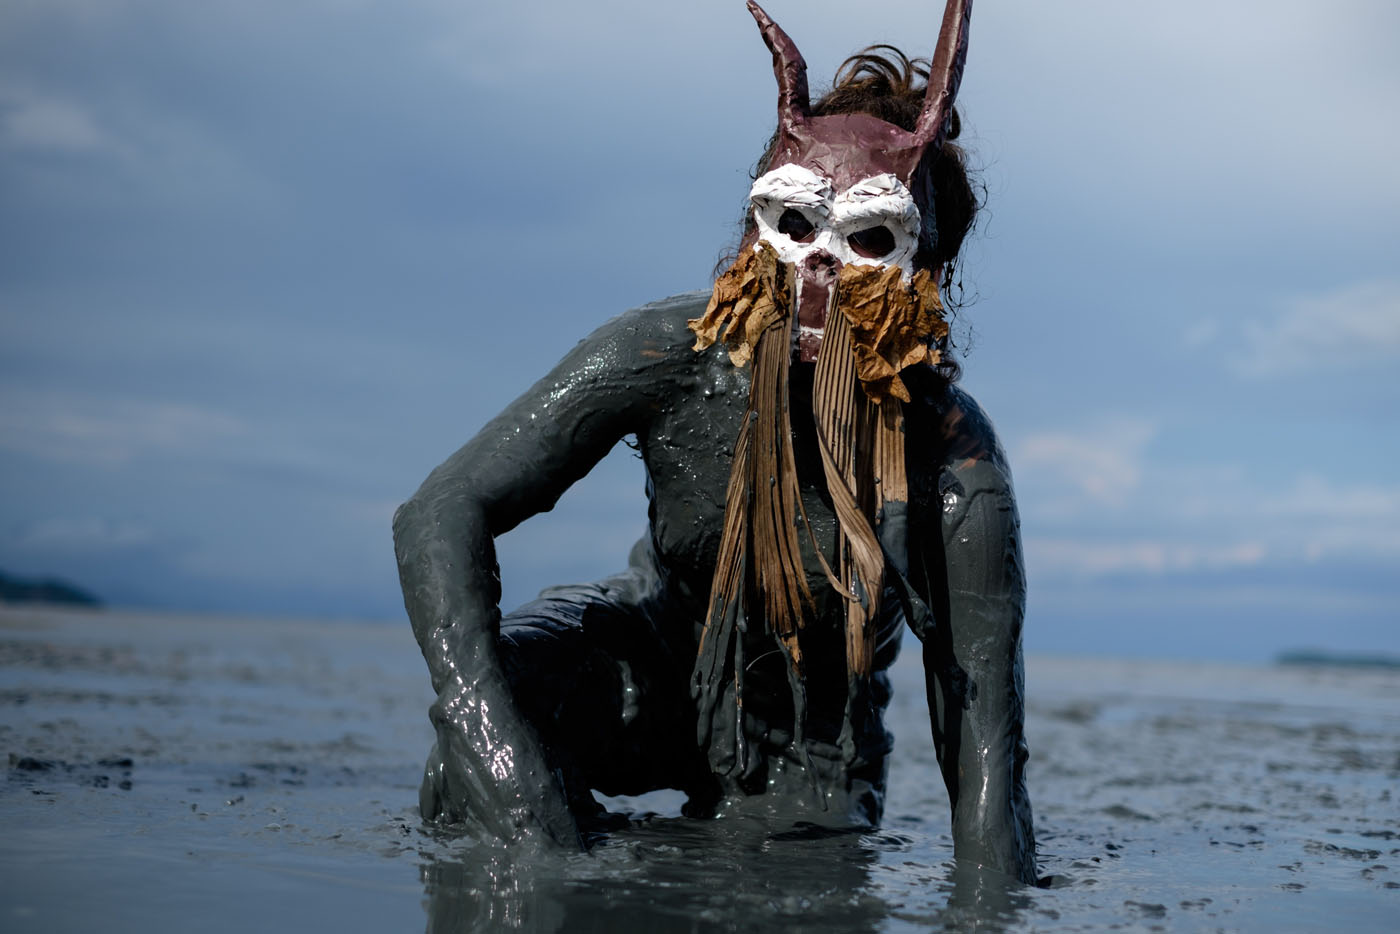 Brazil's 'Bloco da Lama' mud carnival